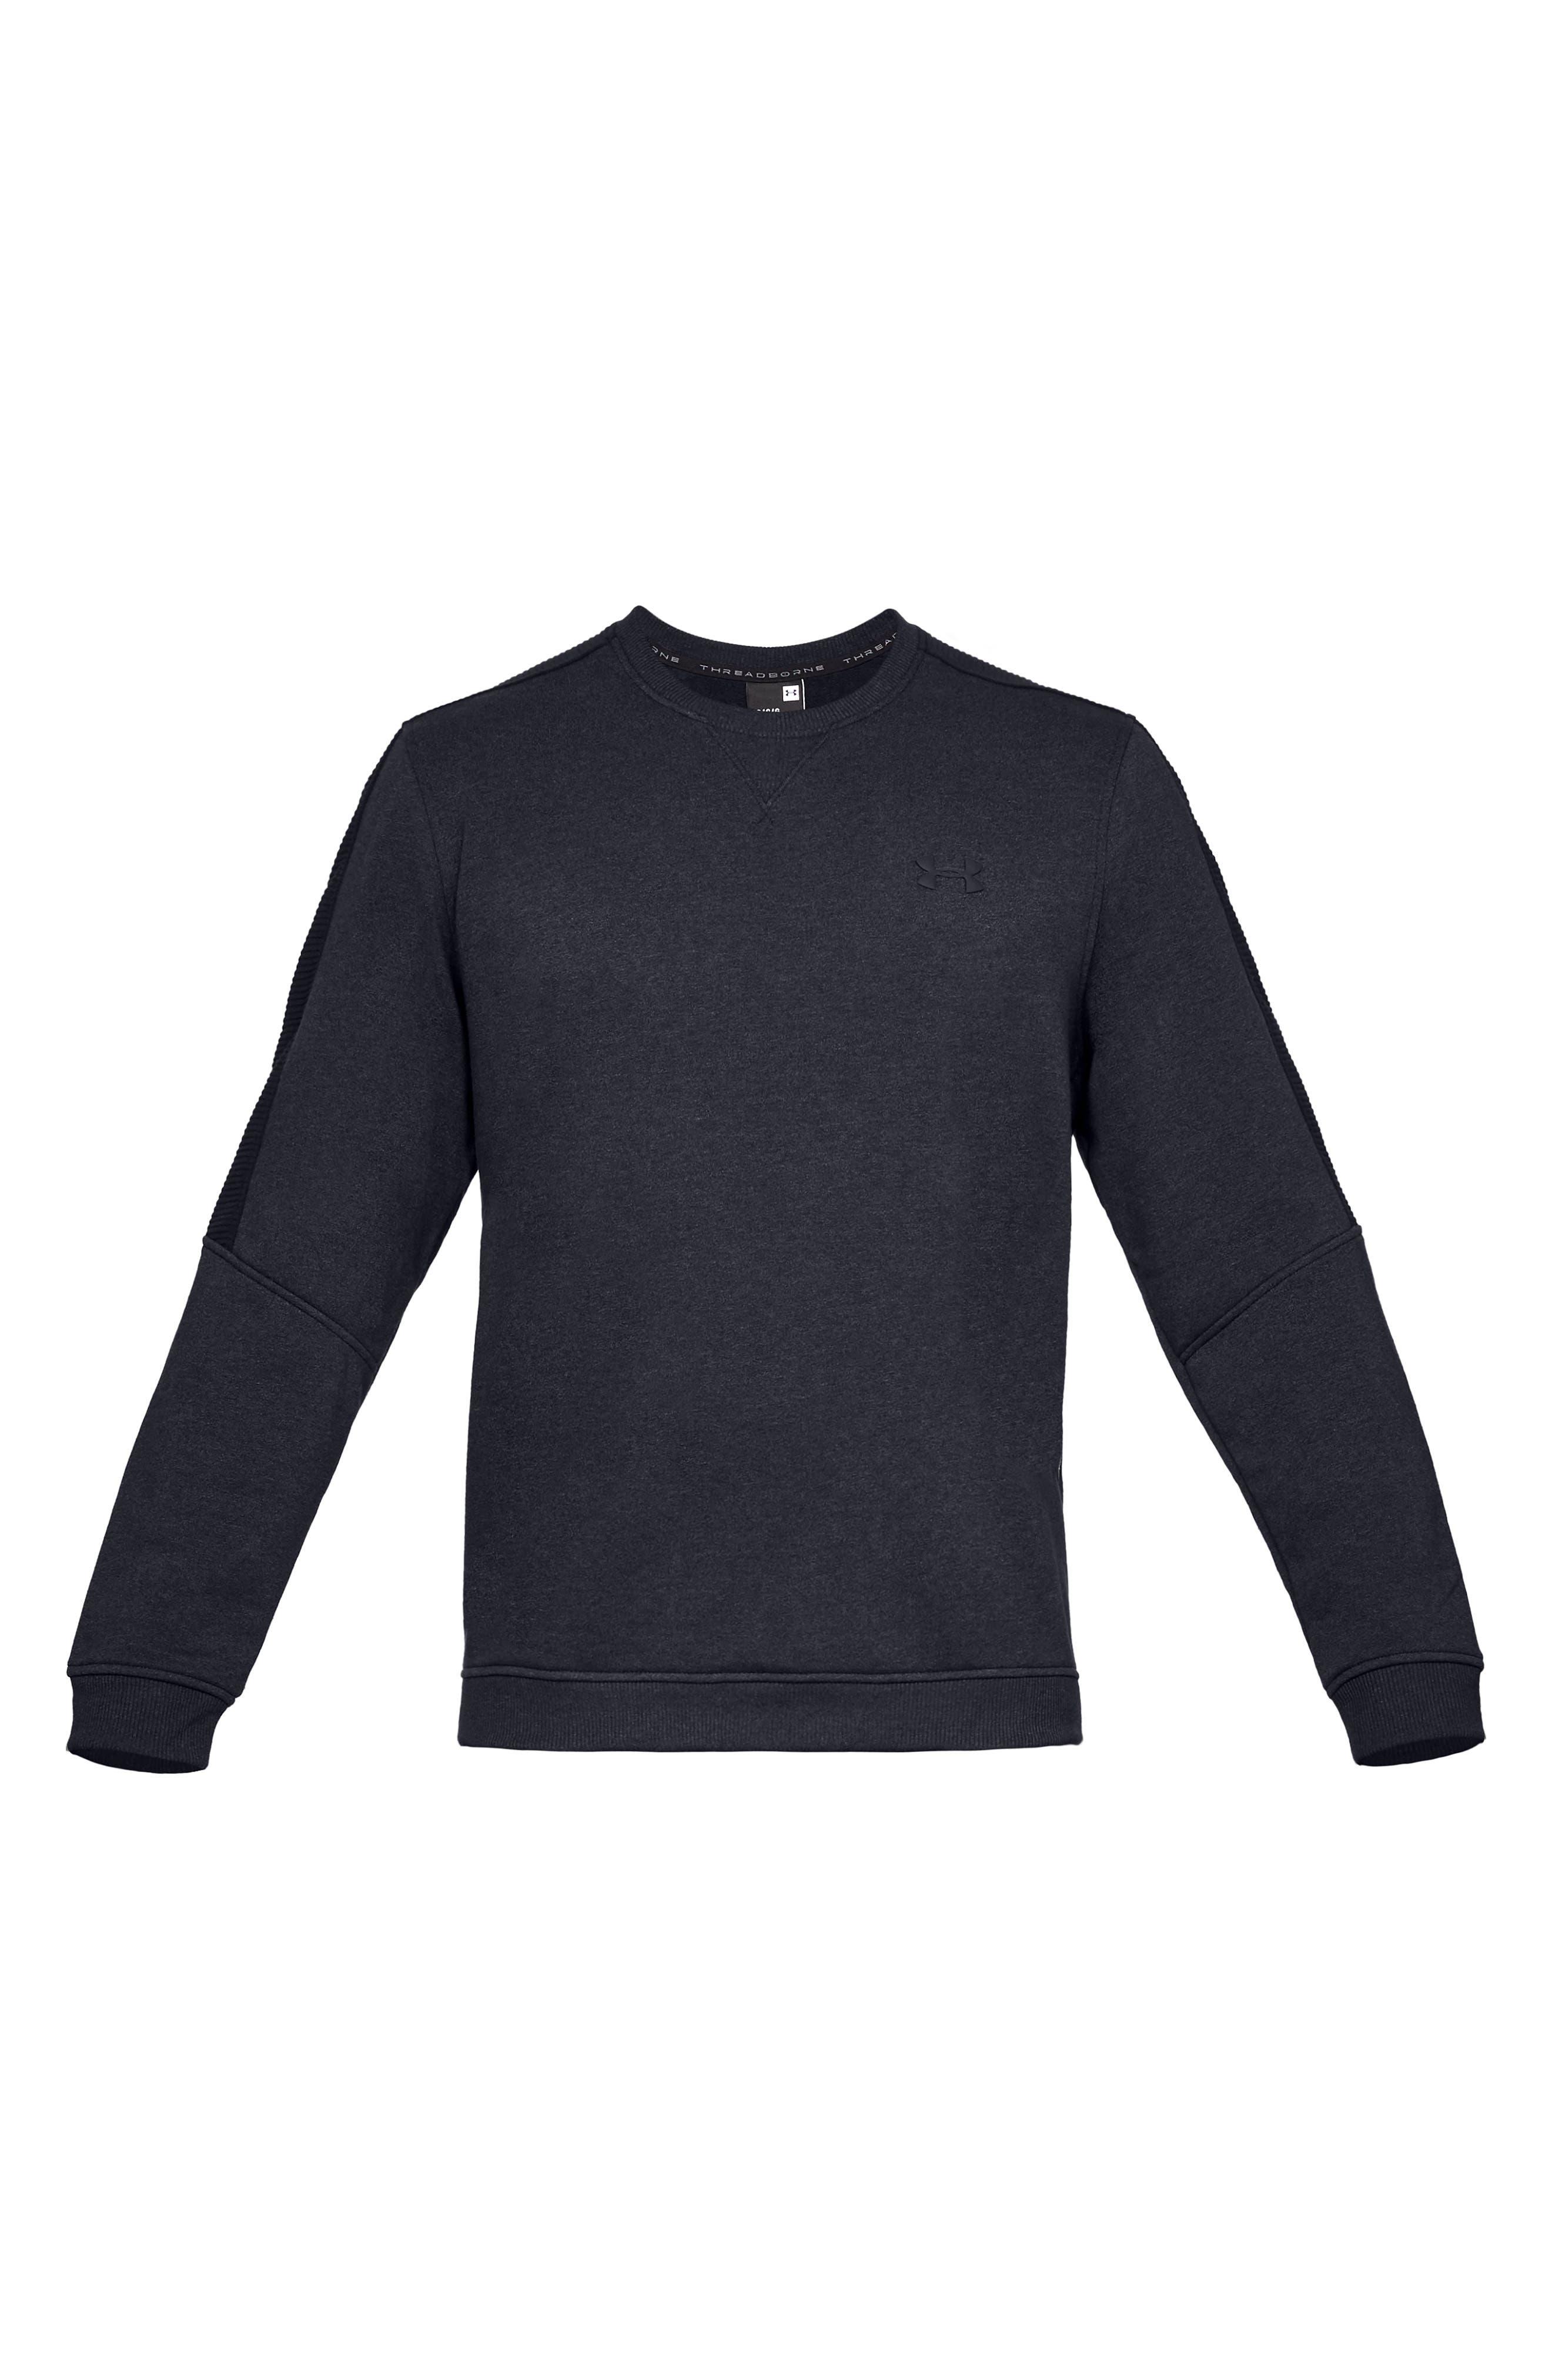 Threadborne Siro Fleece Crewneck Sweatshirt,                             Alternate thumbnail 4, color,                             BLACK/ BLACK/ BLACK